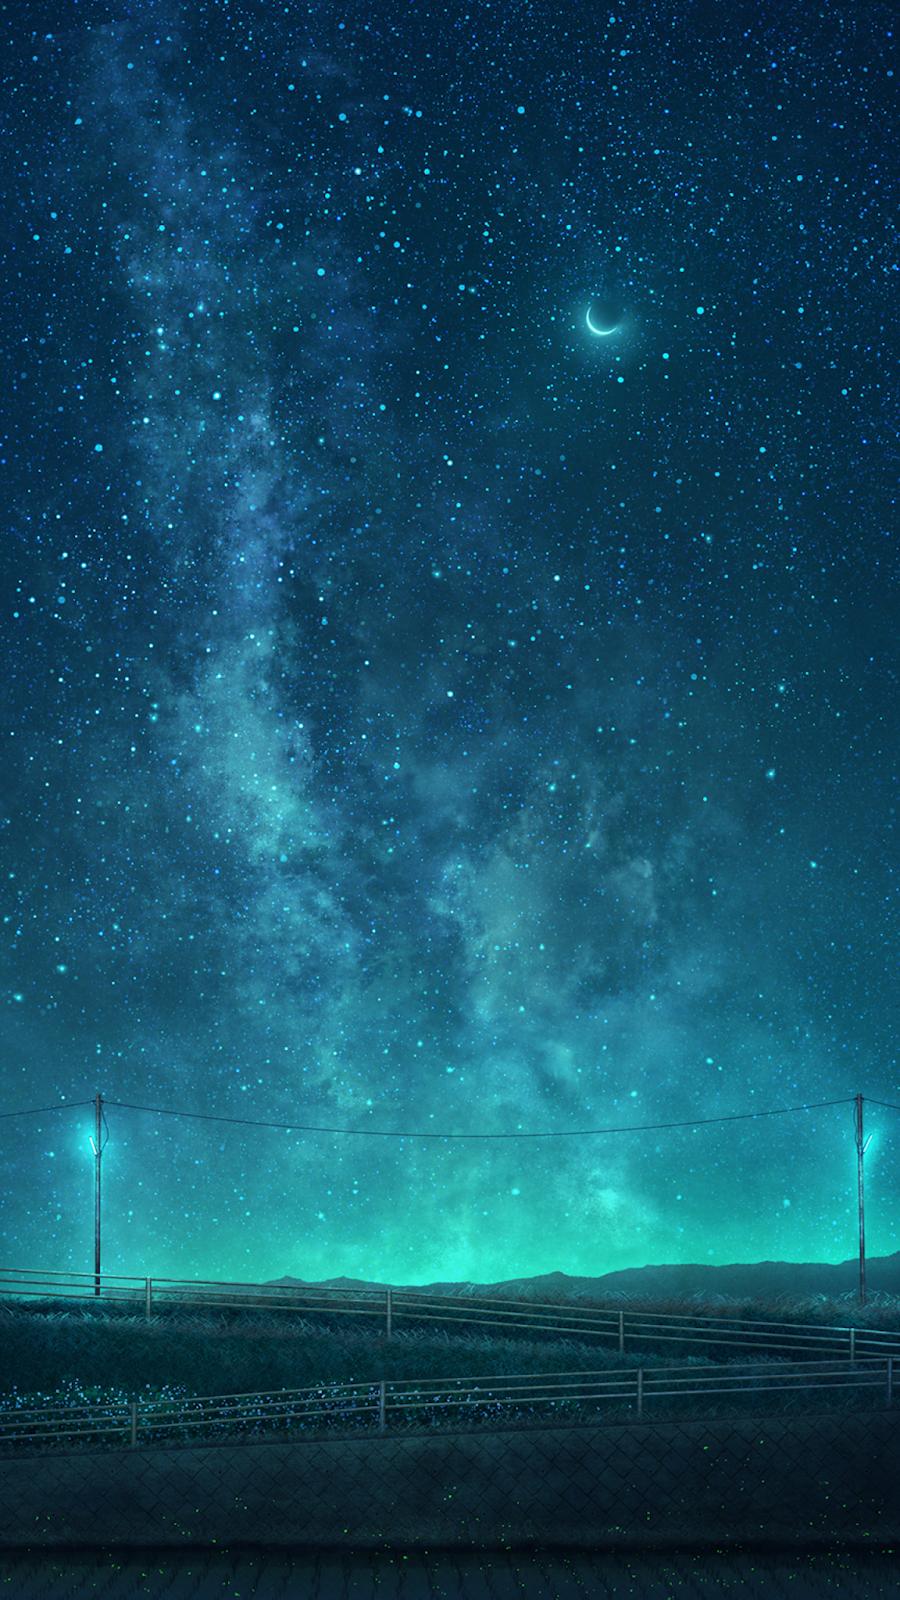 Marvelous night sky in 2020 Scenery wallpaper, Night